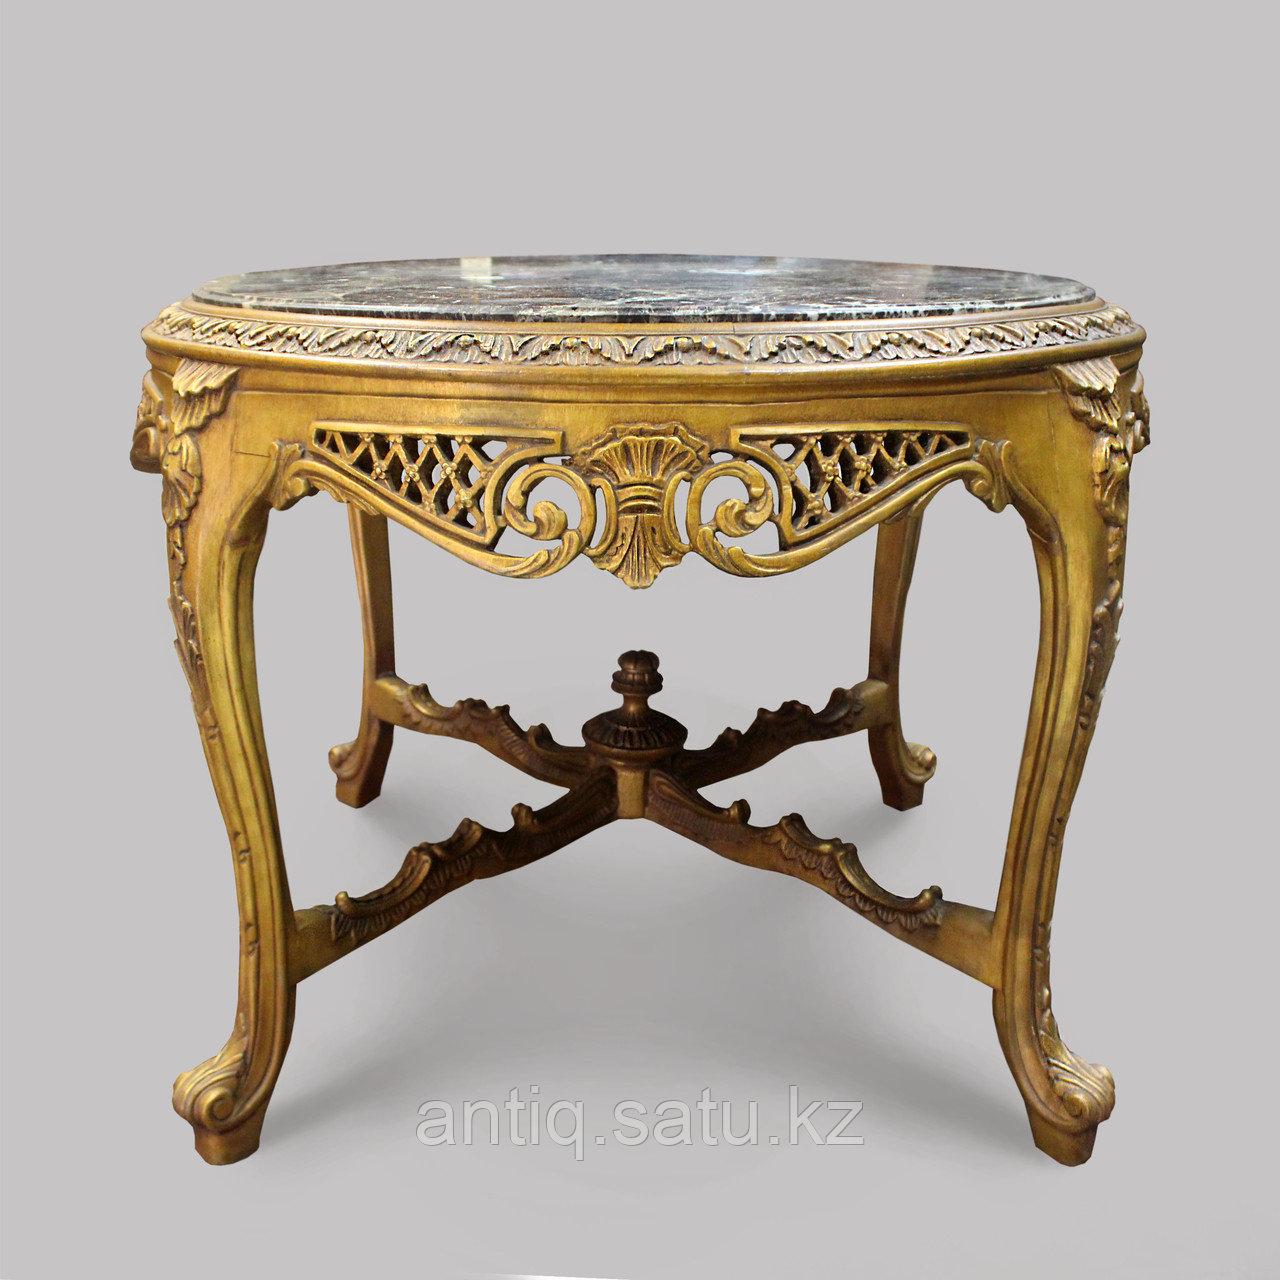 Стол обеденный в стиле Рококо - фото 1